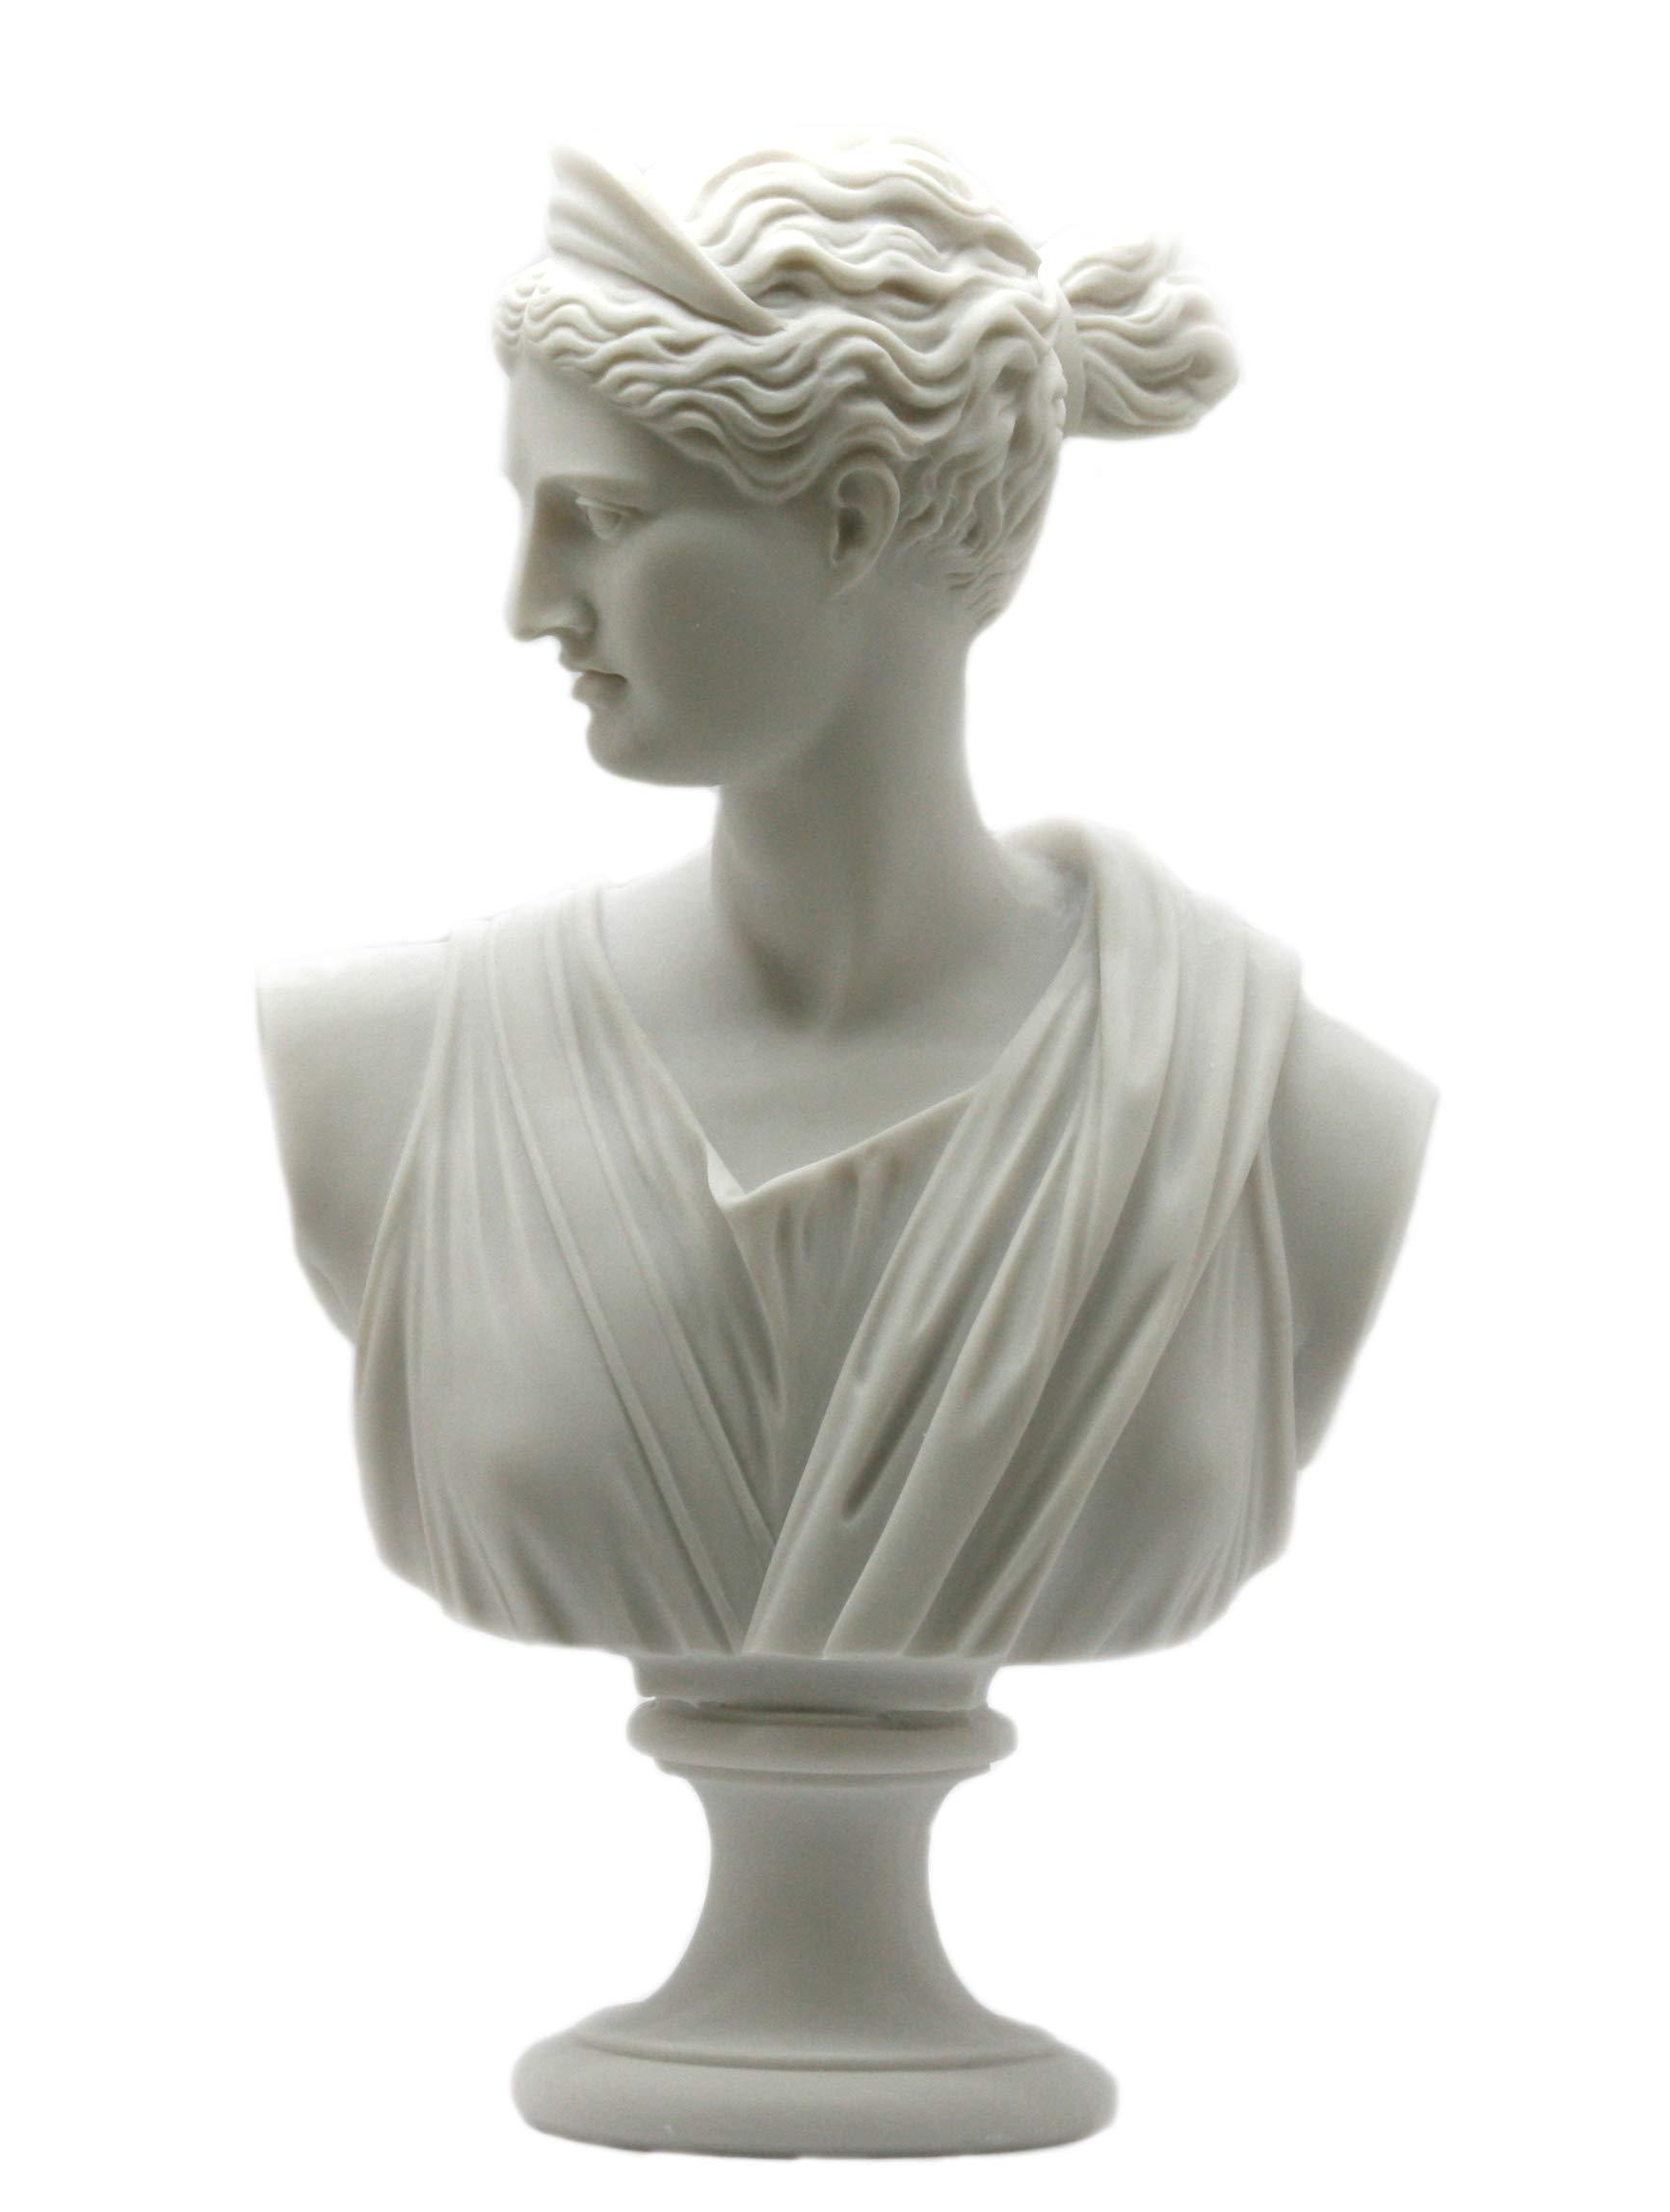 greekartshop Artemis Diana Bust Head Greek Roman Goddess Statue Sculpture 11.8΄΄